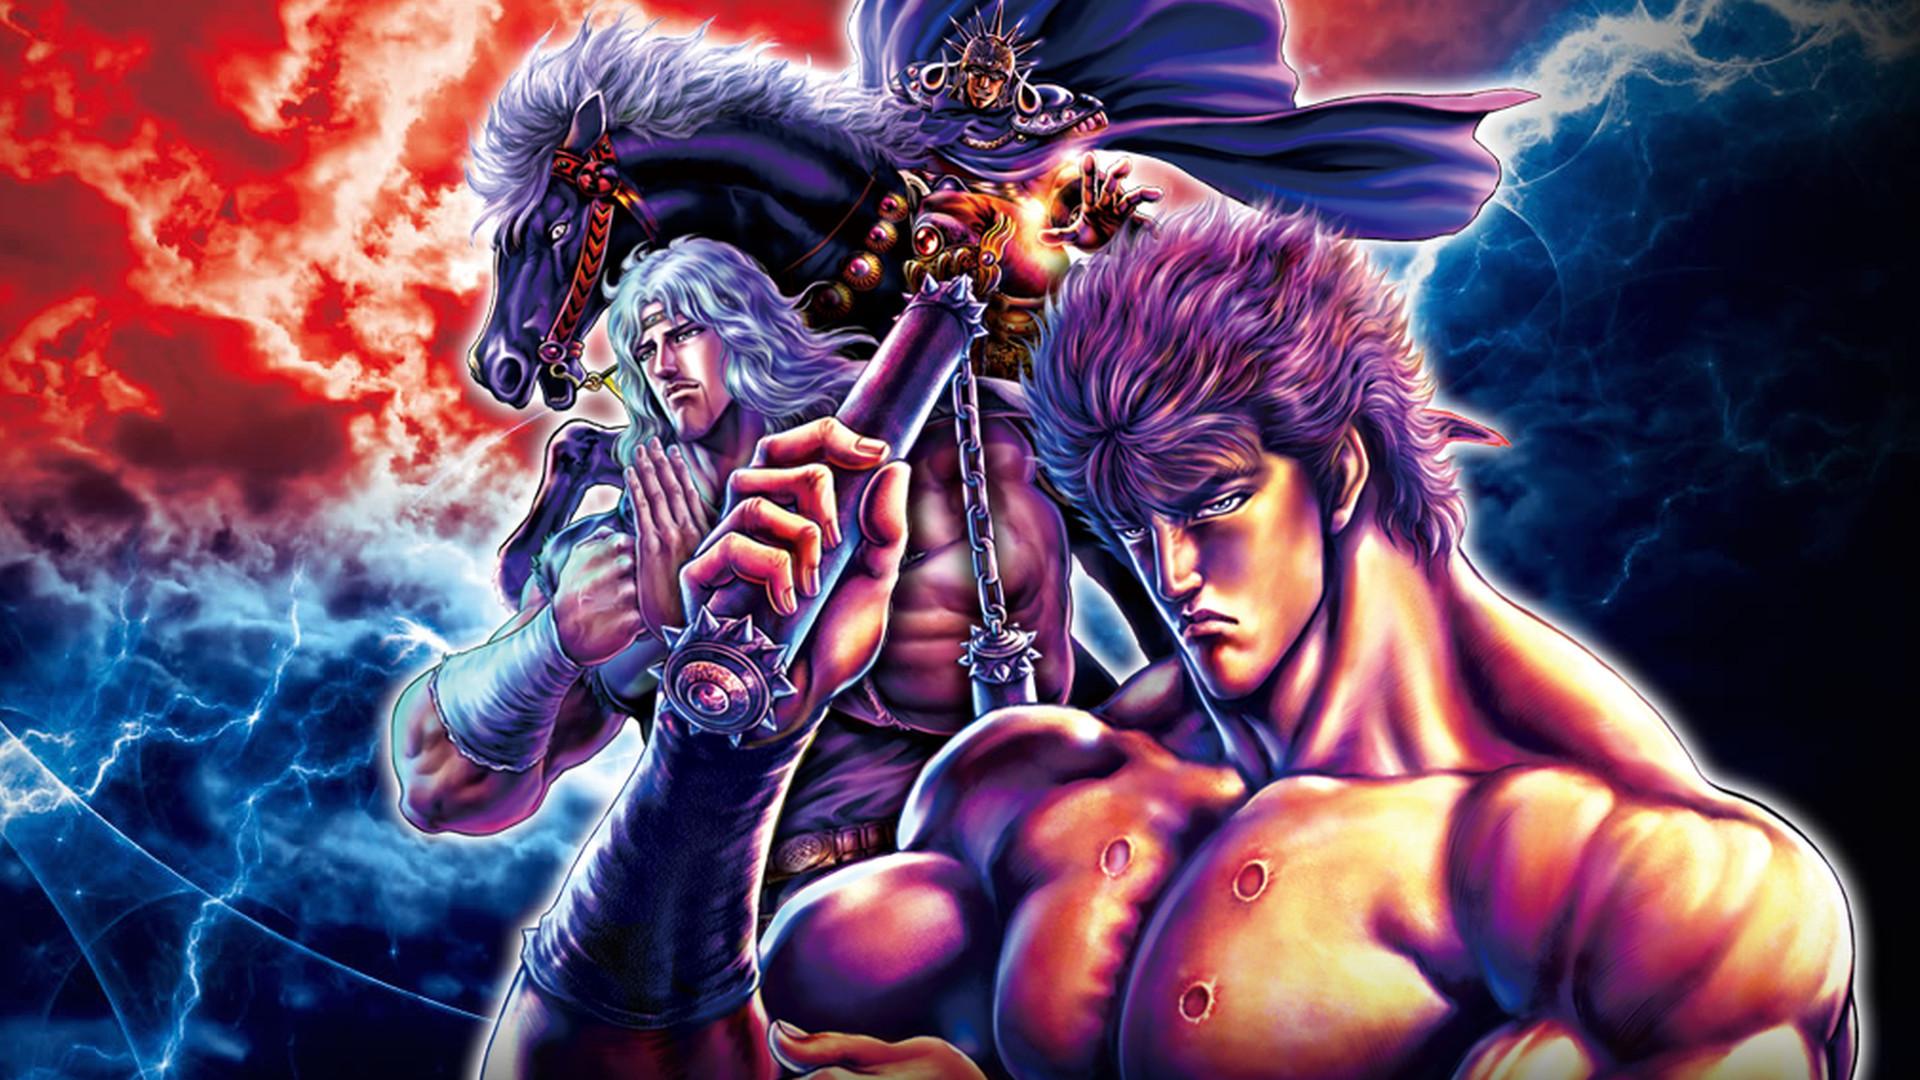 … Fist of the North Star (Hokuto No Ken) – Fanart – Background …